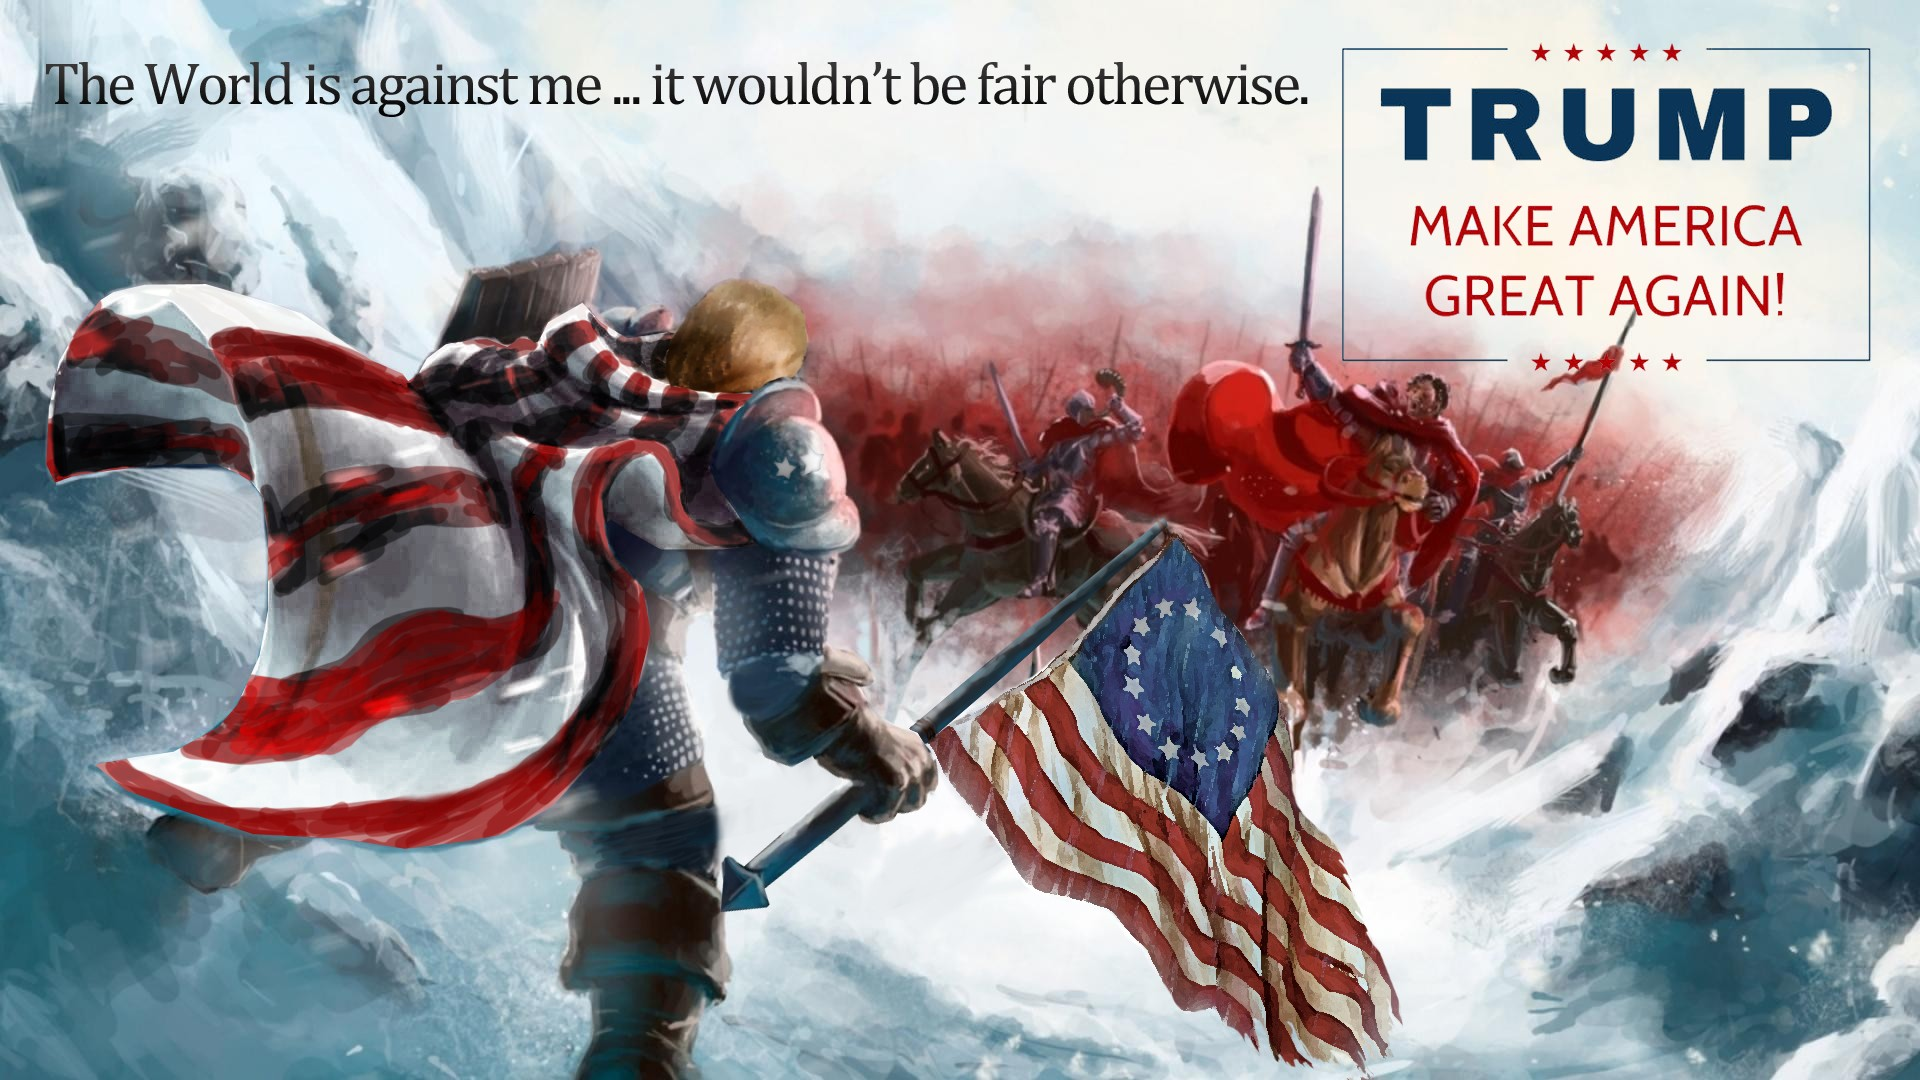 Donald Trump Hd Wallpaper Background Image 1920x1080 Id 708196